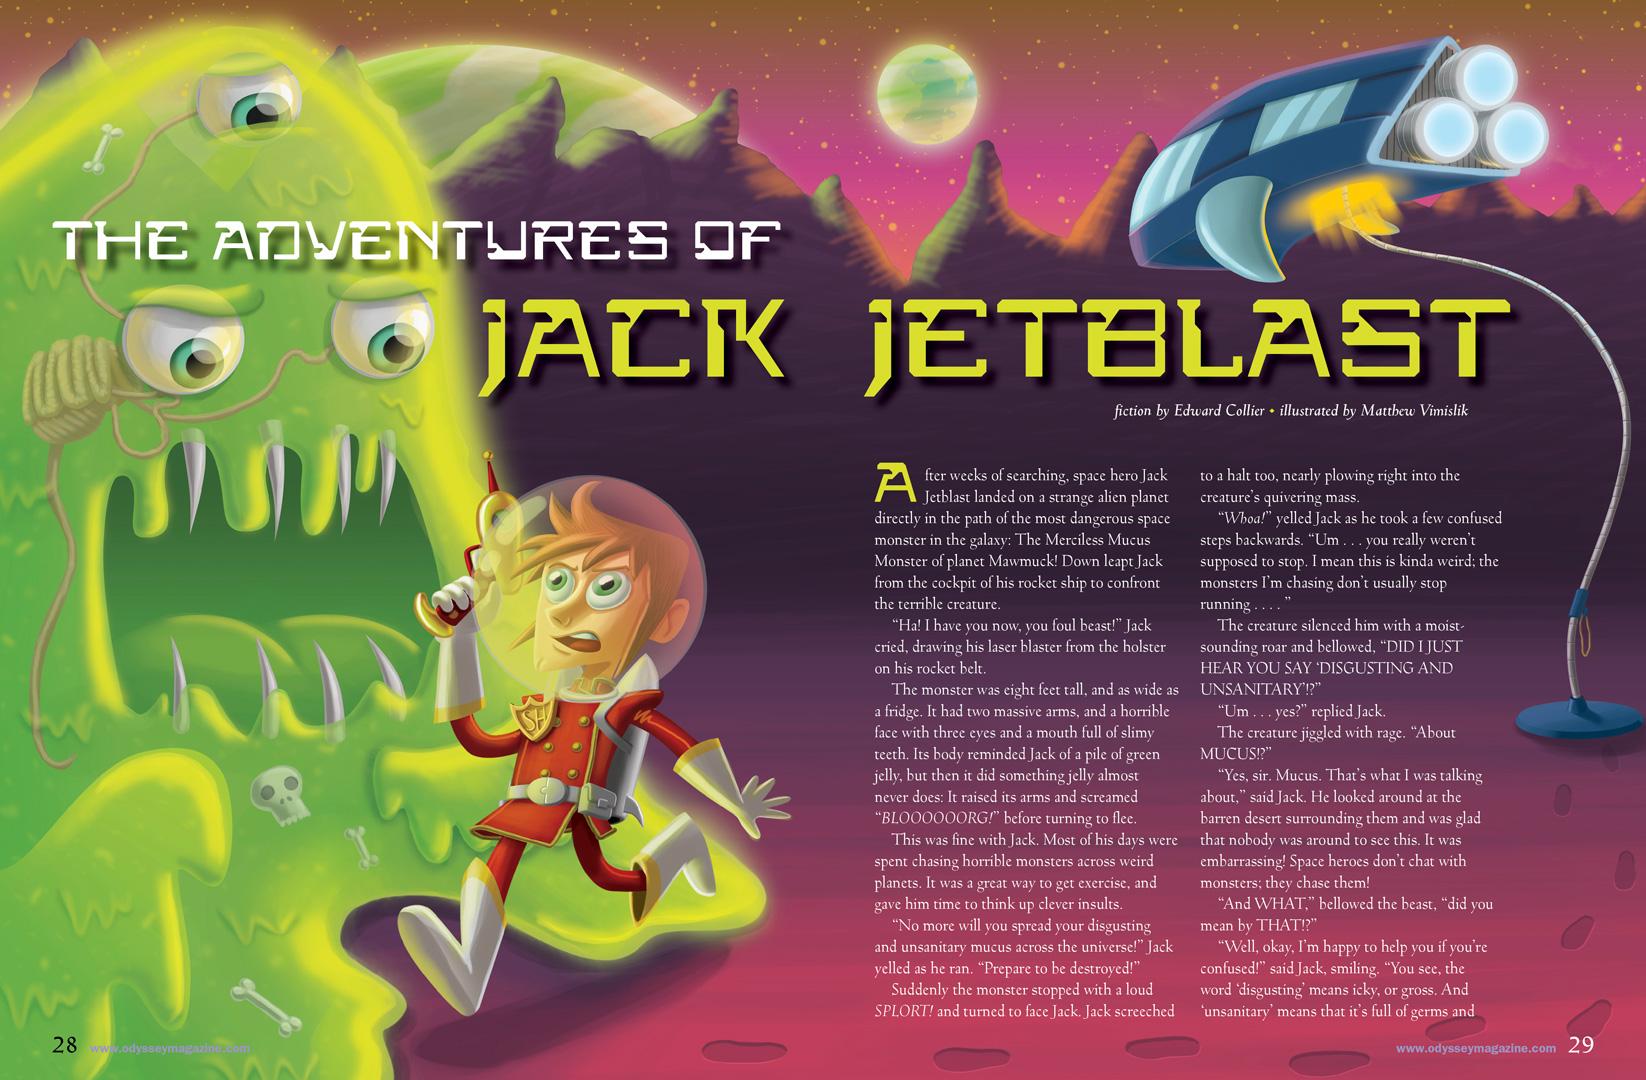 The Adventures of Jack Jetblast